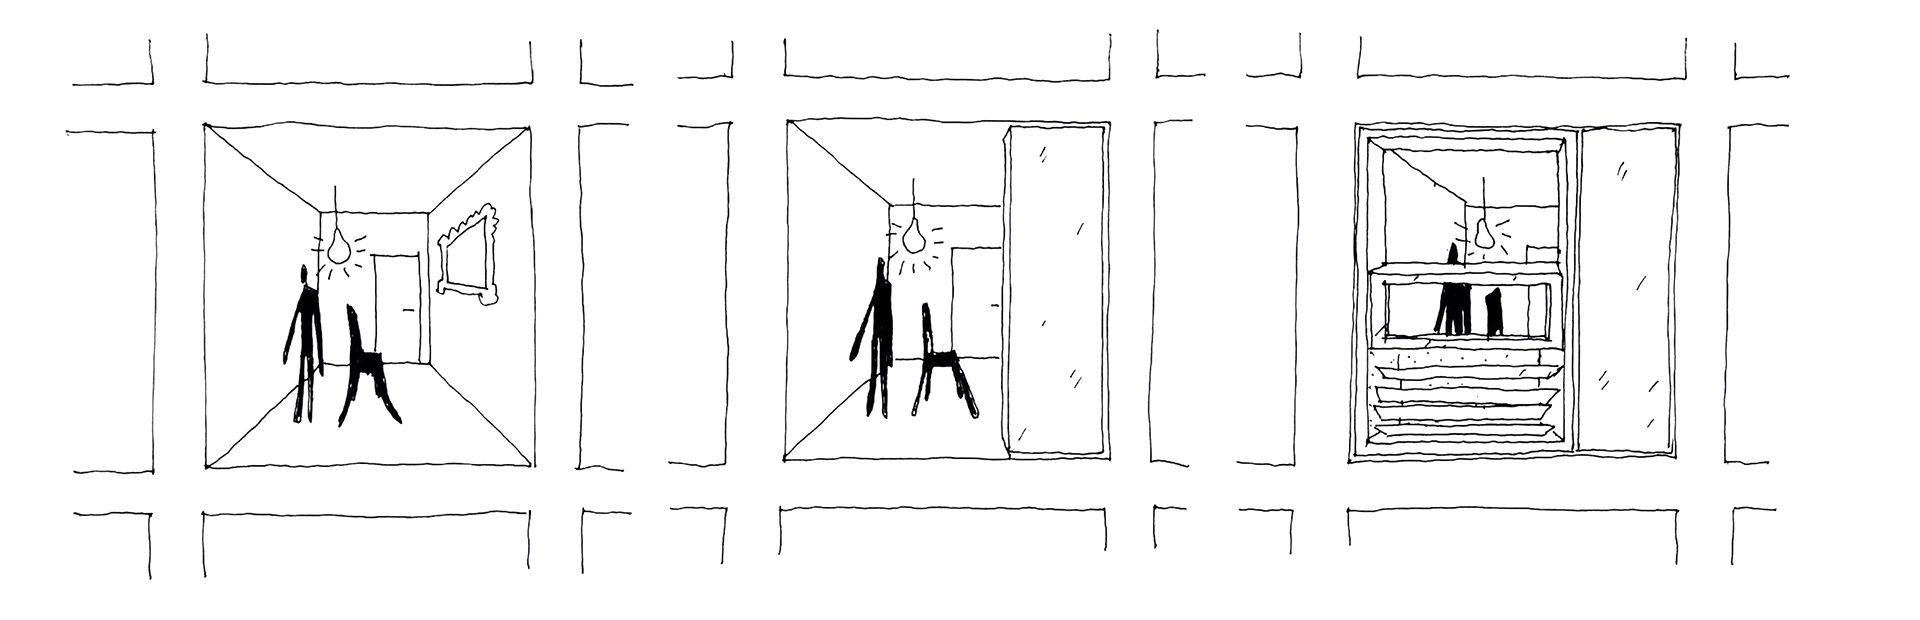 Fasada - Detal